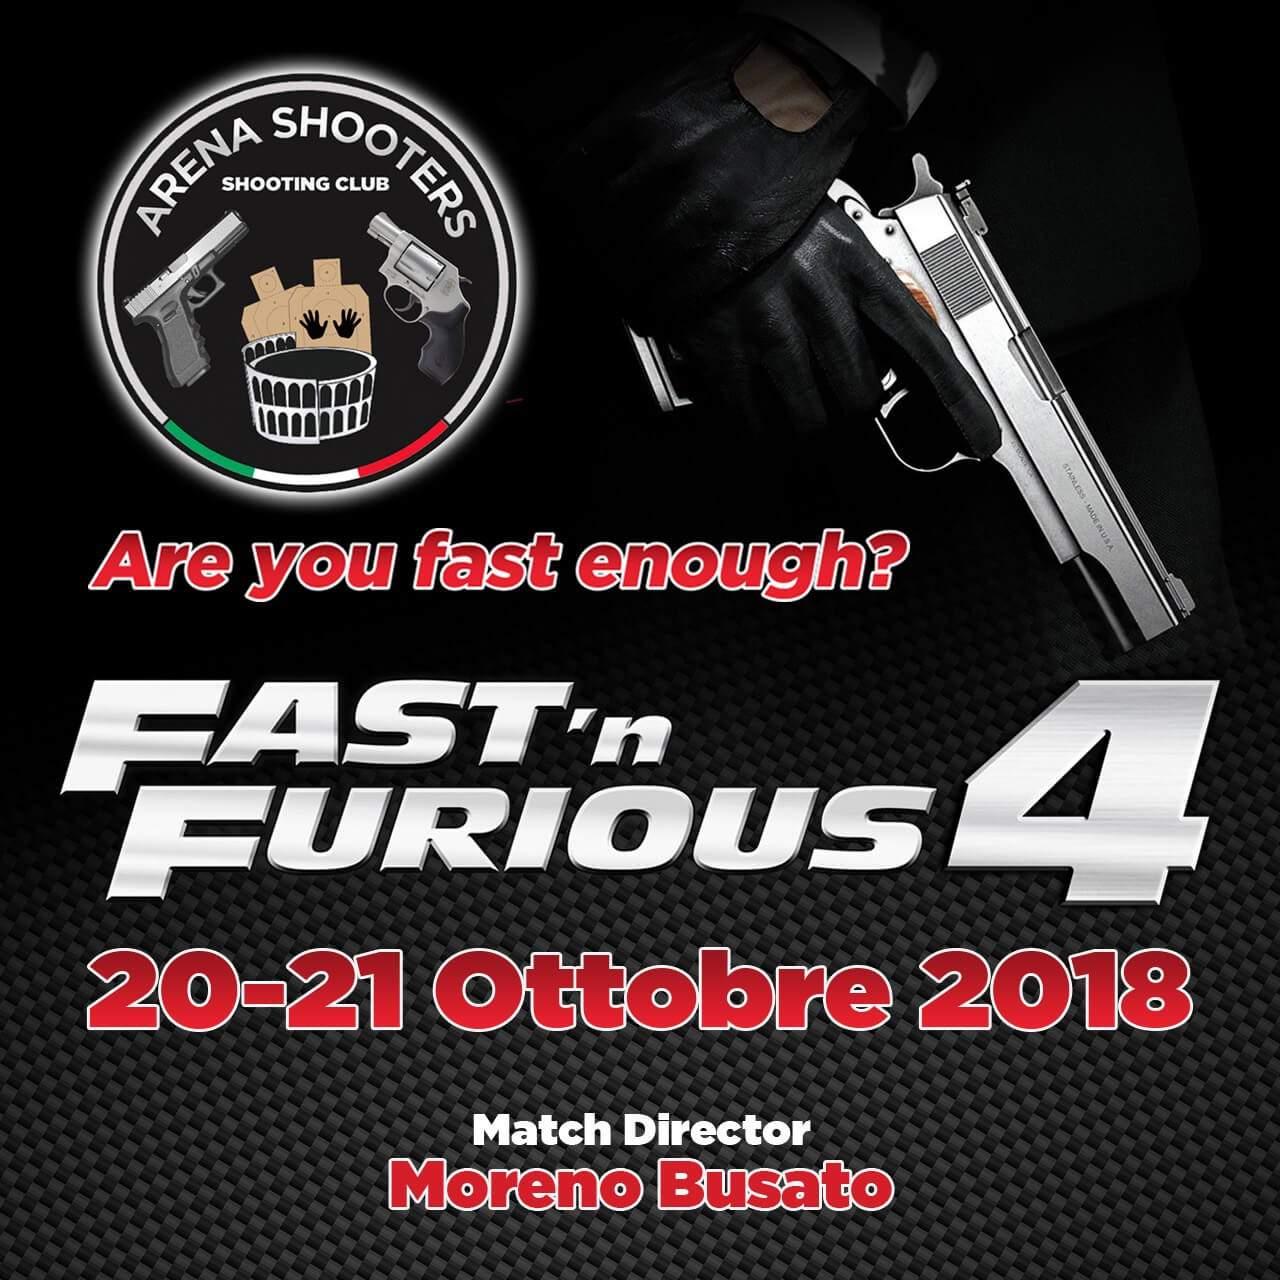 FastFurious 4